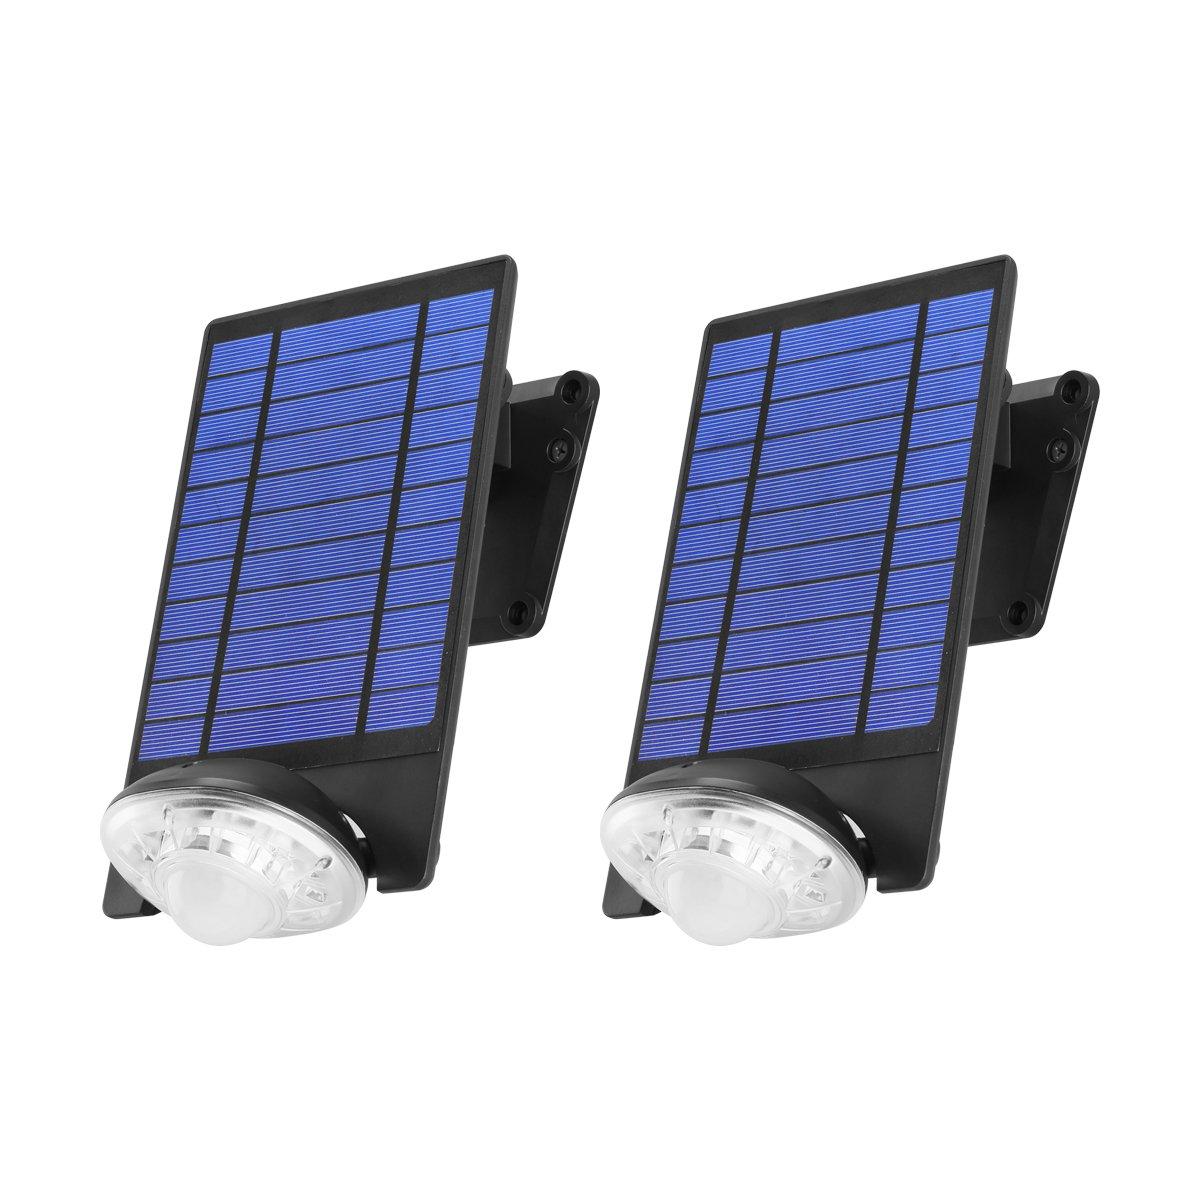 Link2Home EM-SL451B-2PK 250 Lumen LED Solar Security Adjustable Single-Head Sensor Spotlight with Photocell Technology and Ground Stake/Wall Mounting Bracket in Black, 2pk